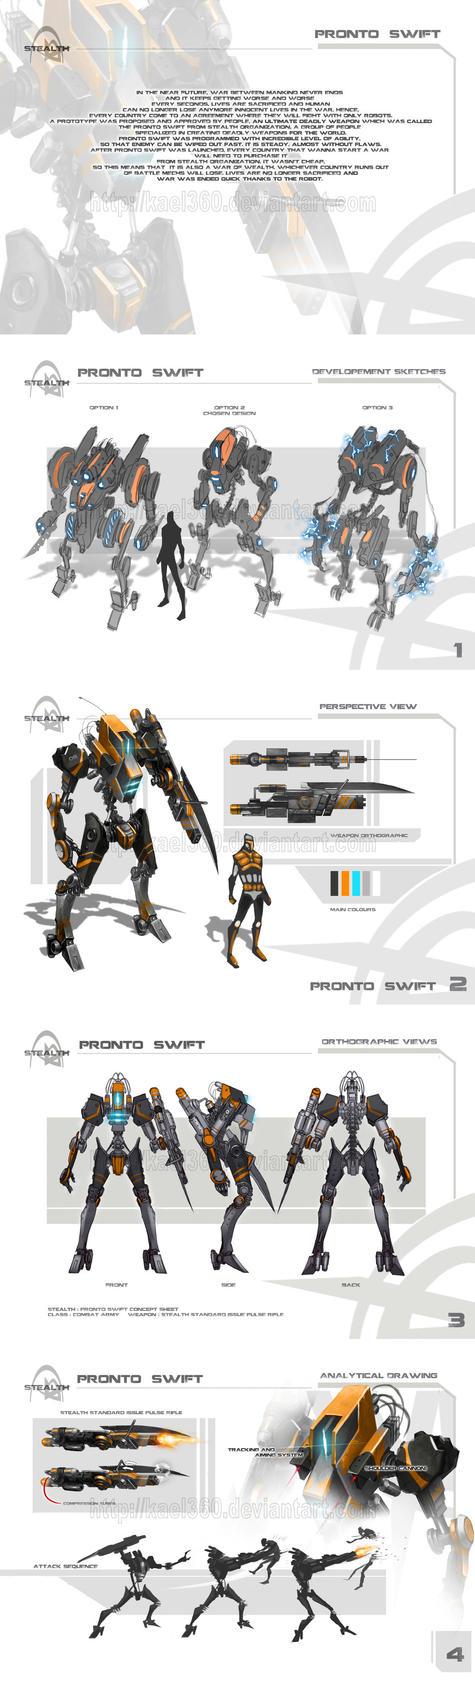 Concept Design 2 by KaelNgu